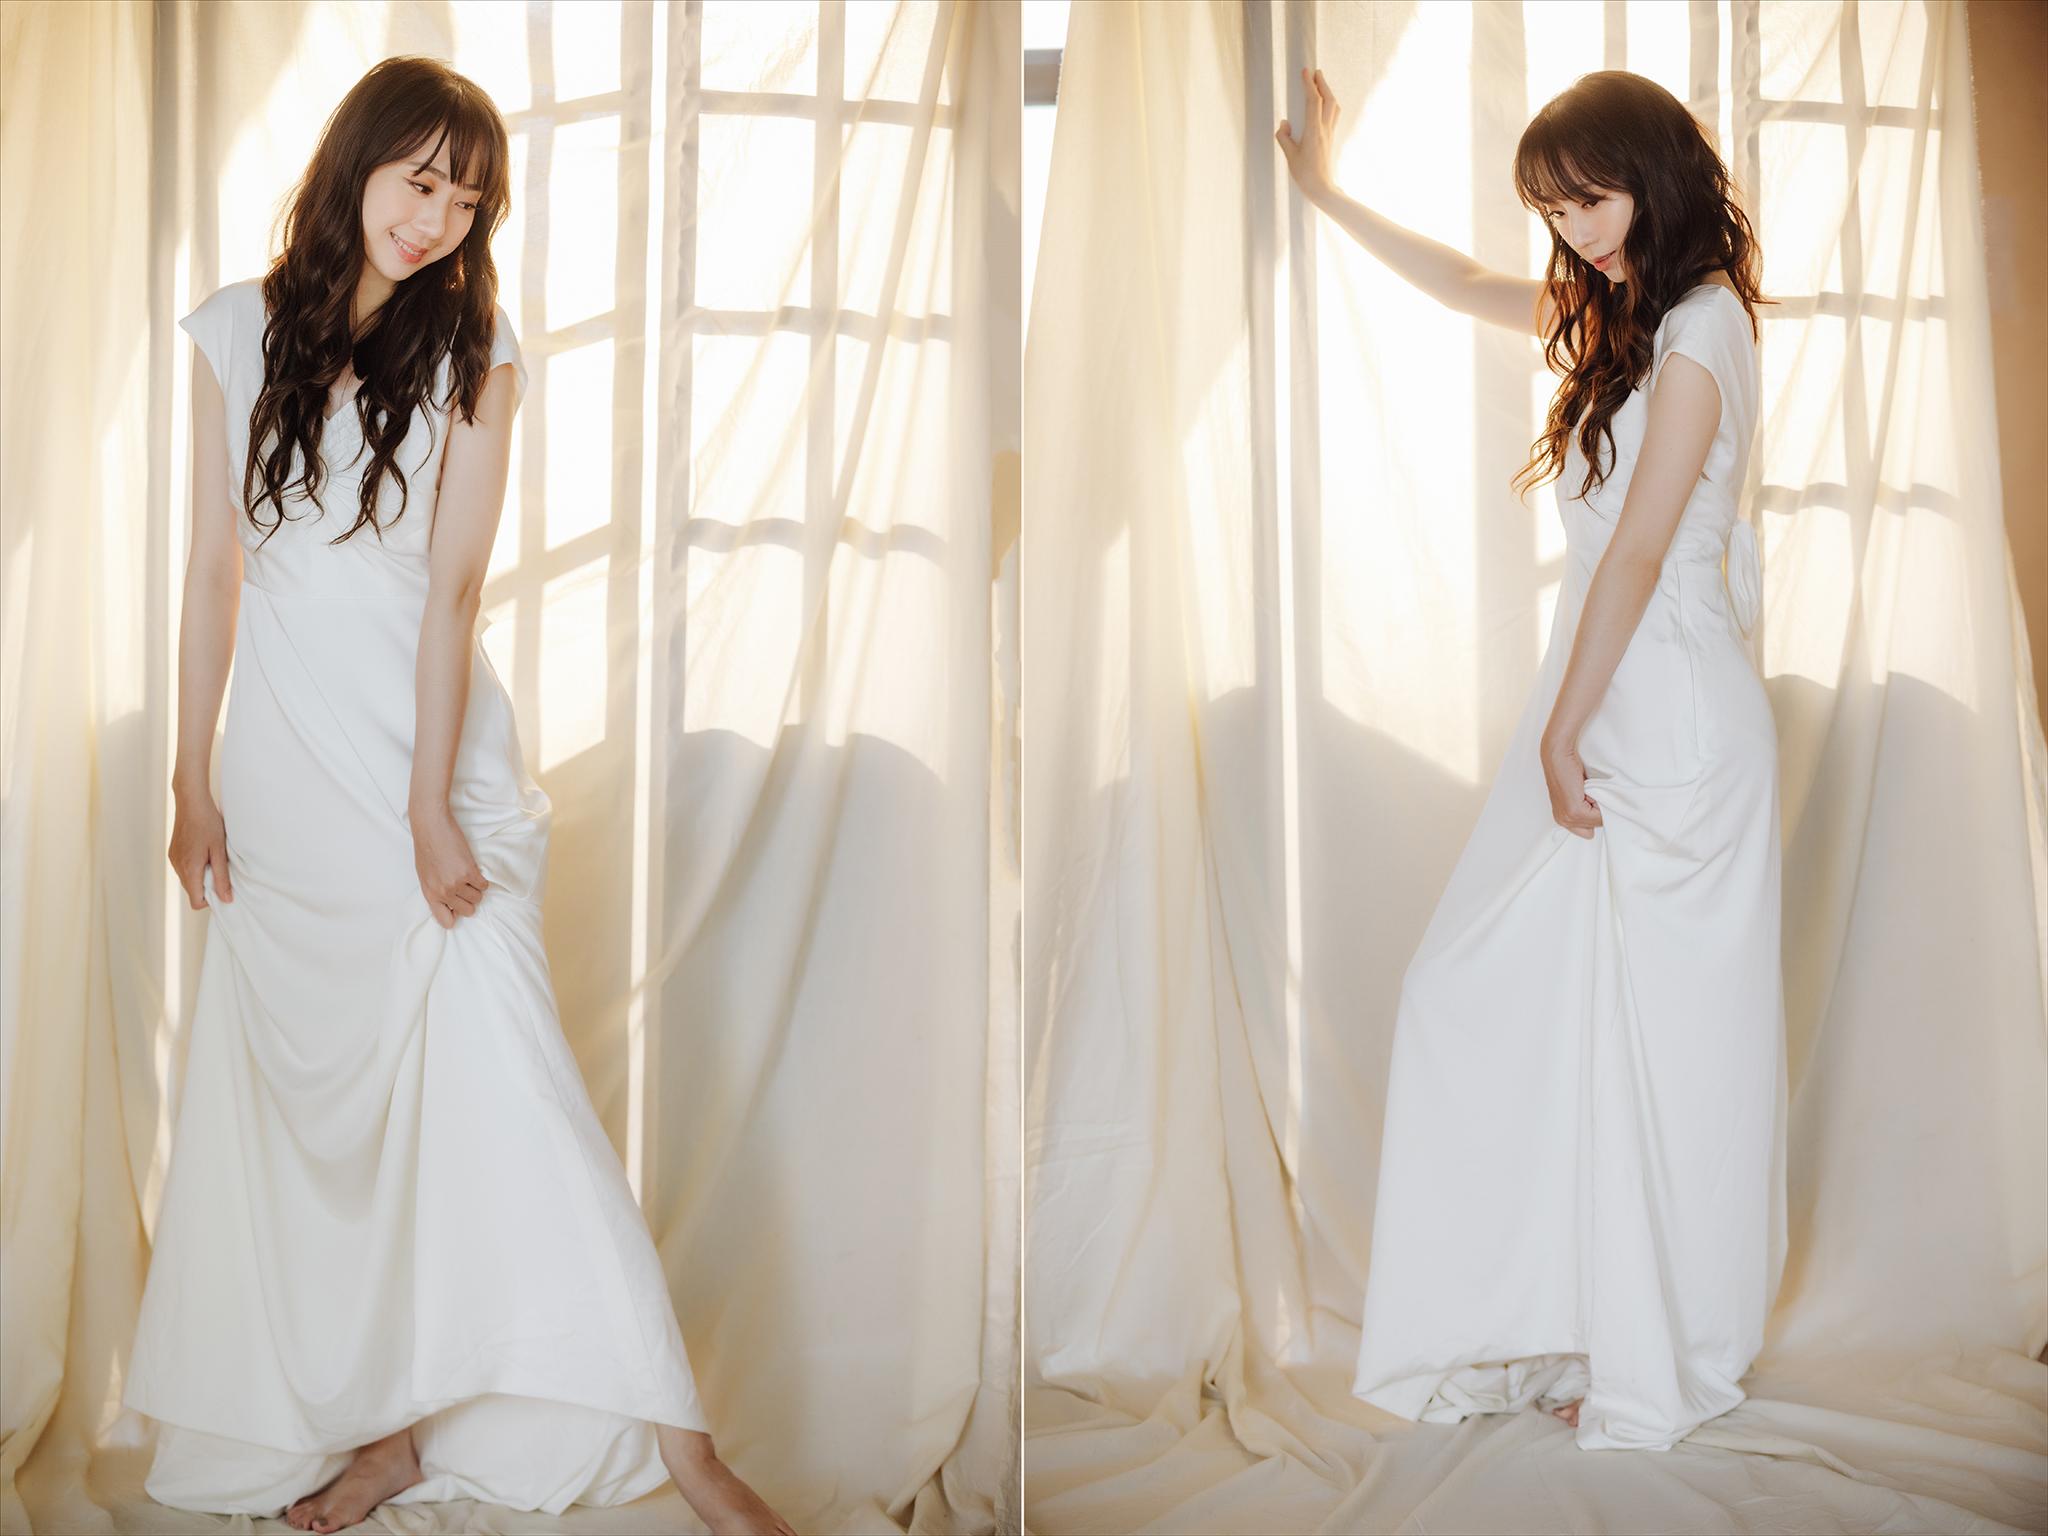 50660109997 2f91d2ed8c o - 【自主婚紗】+Melody+